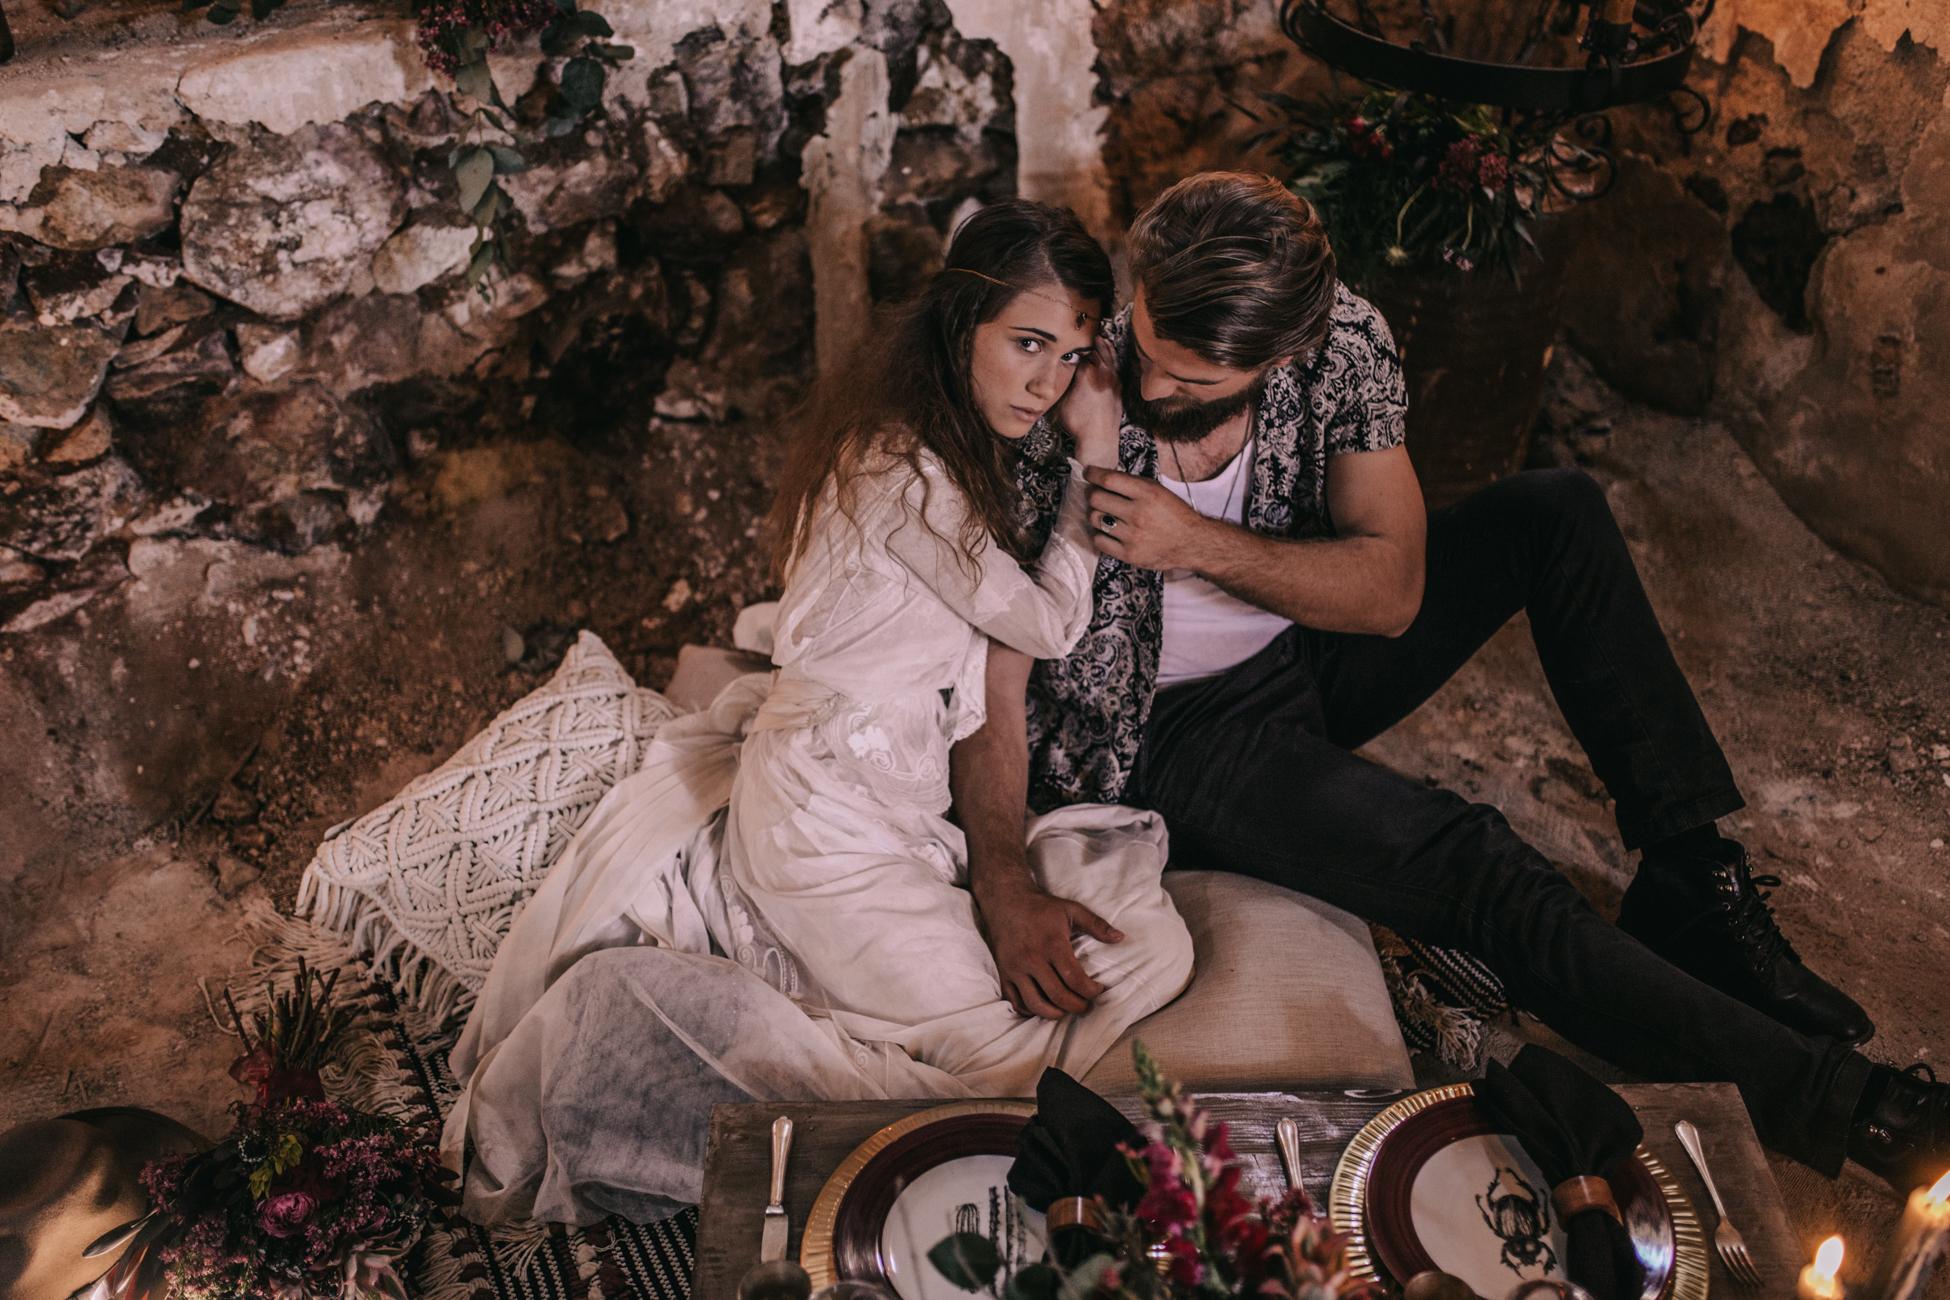 thenortherngirlphotography_photography_thenortherngirl_rebeccascabros_wedding_weddingphotography_weddingphotographer_wood_muebles_deco_bodasdecaramelo_home_bedtime_gaywedding_editorial_desierto_desert_wildestdreams_amortexano-120.jpg